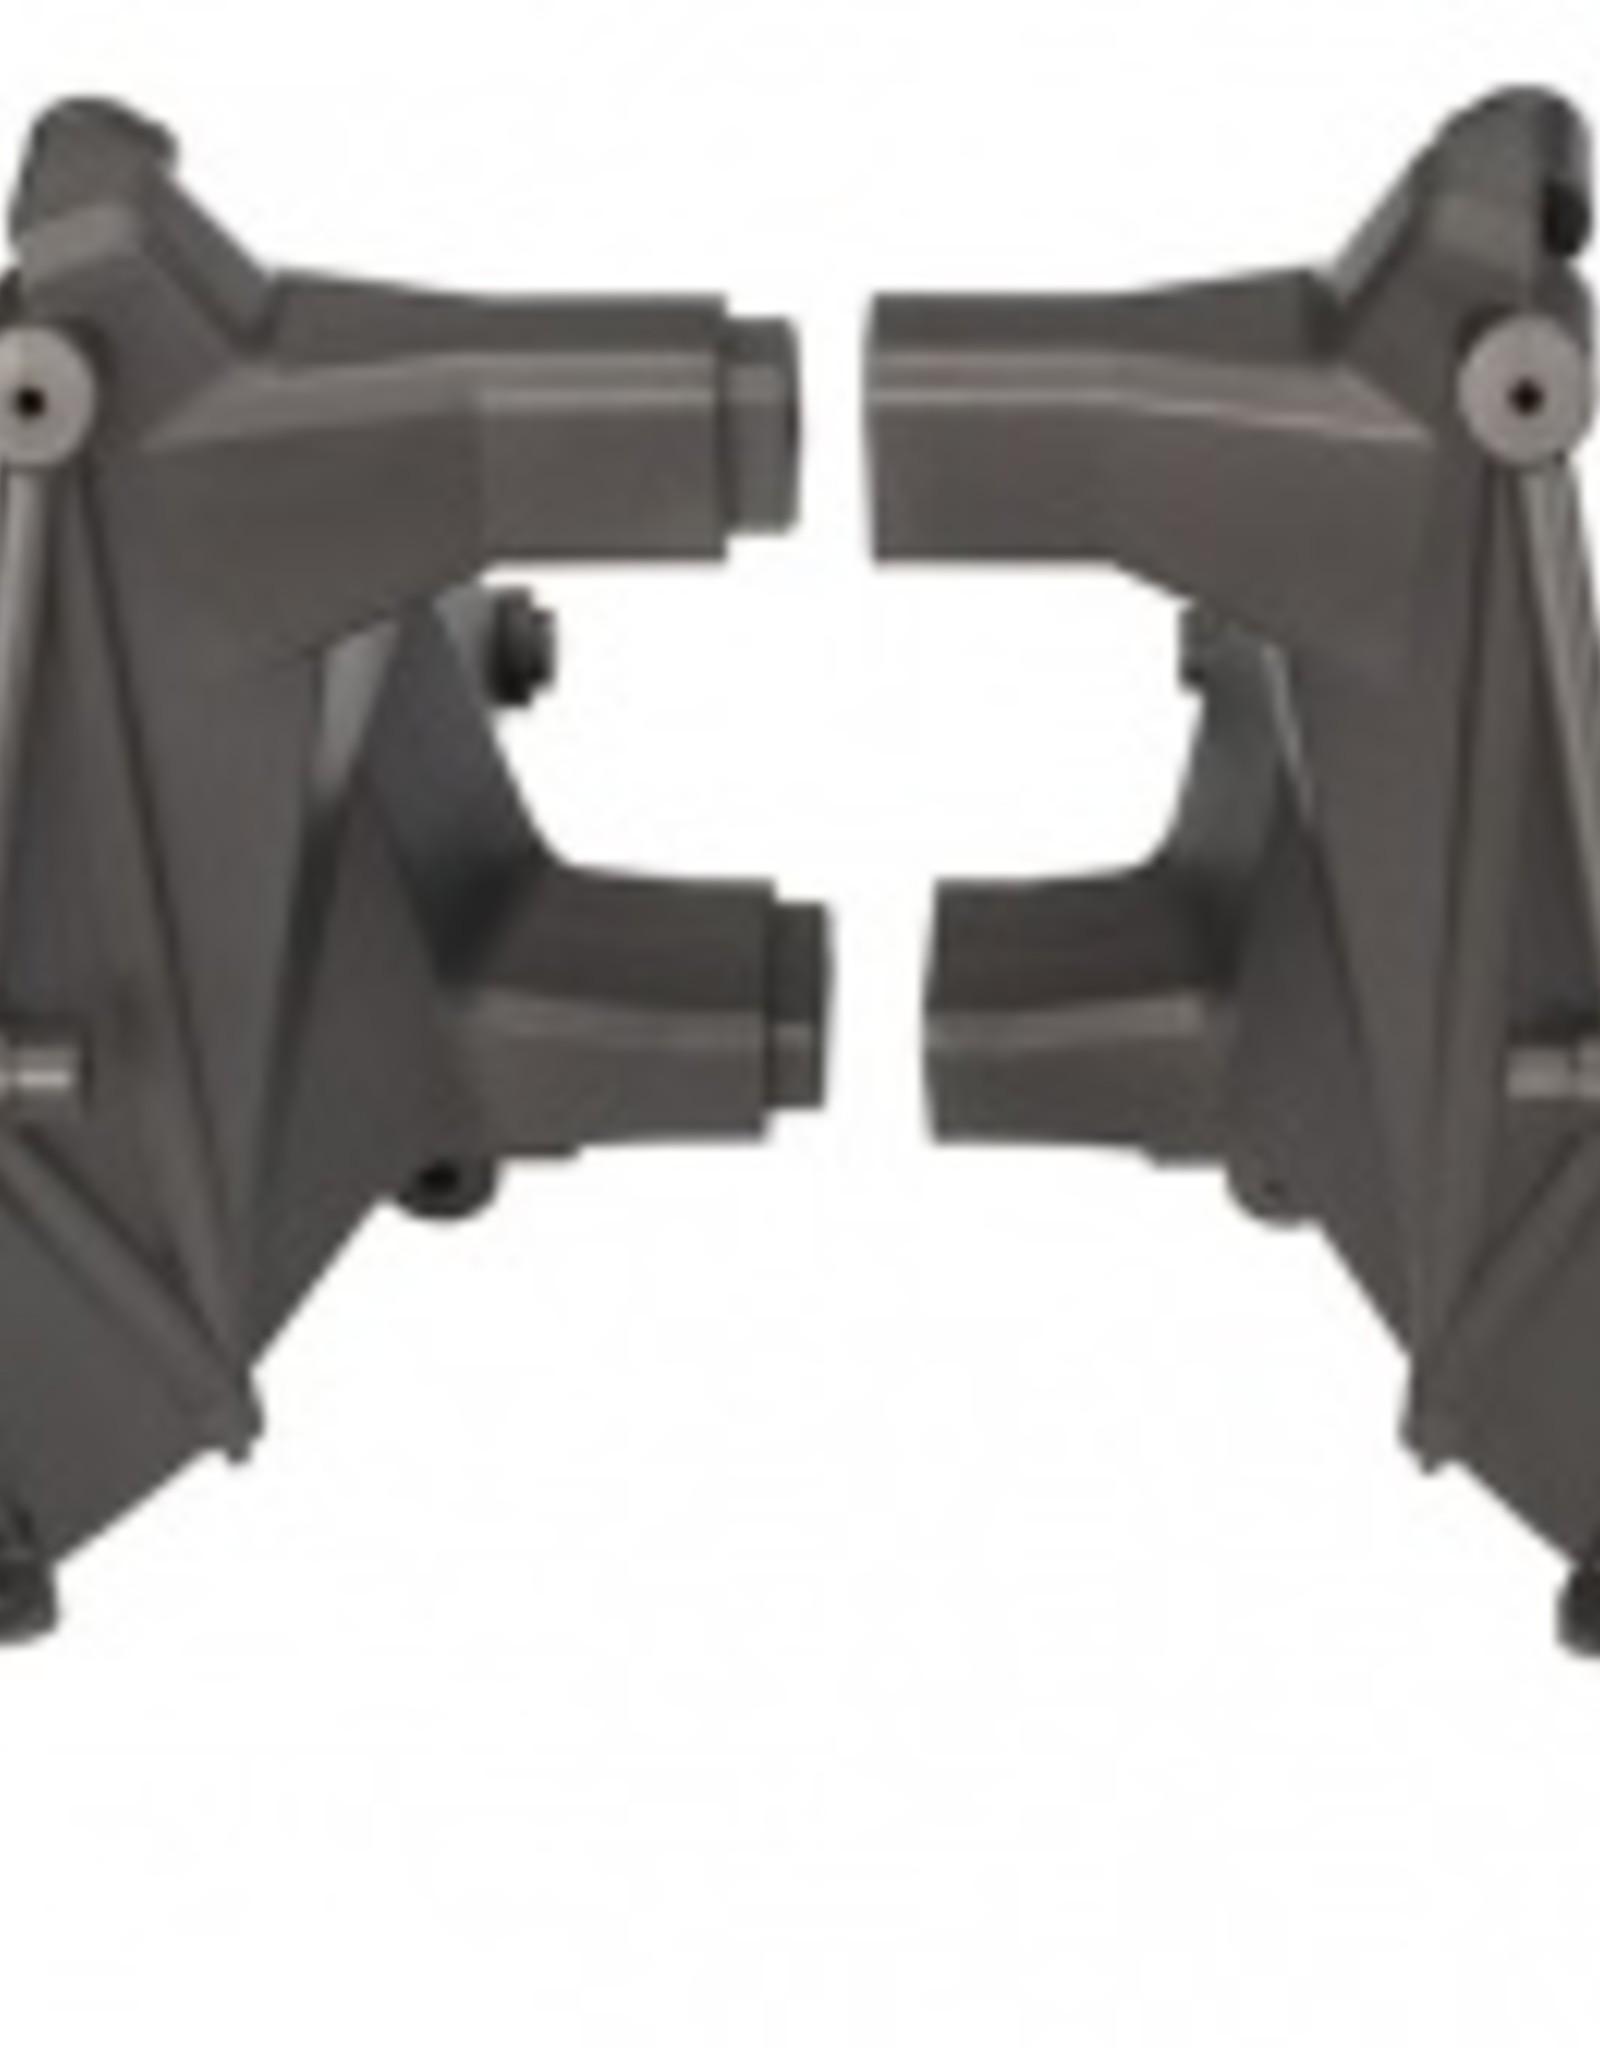 Traxxas Traxxas X-Maxx Shock tower, rear (left & right halves)